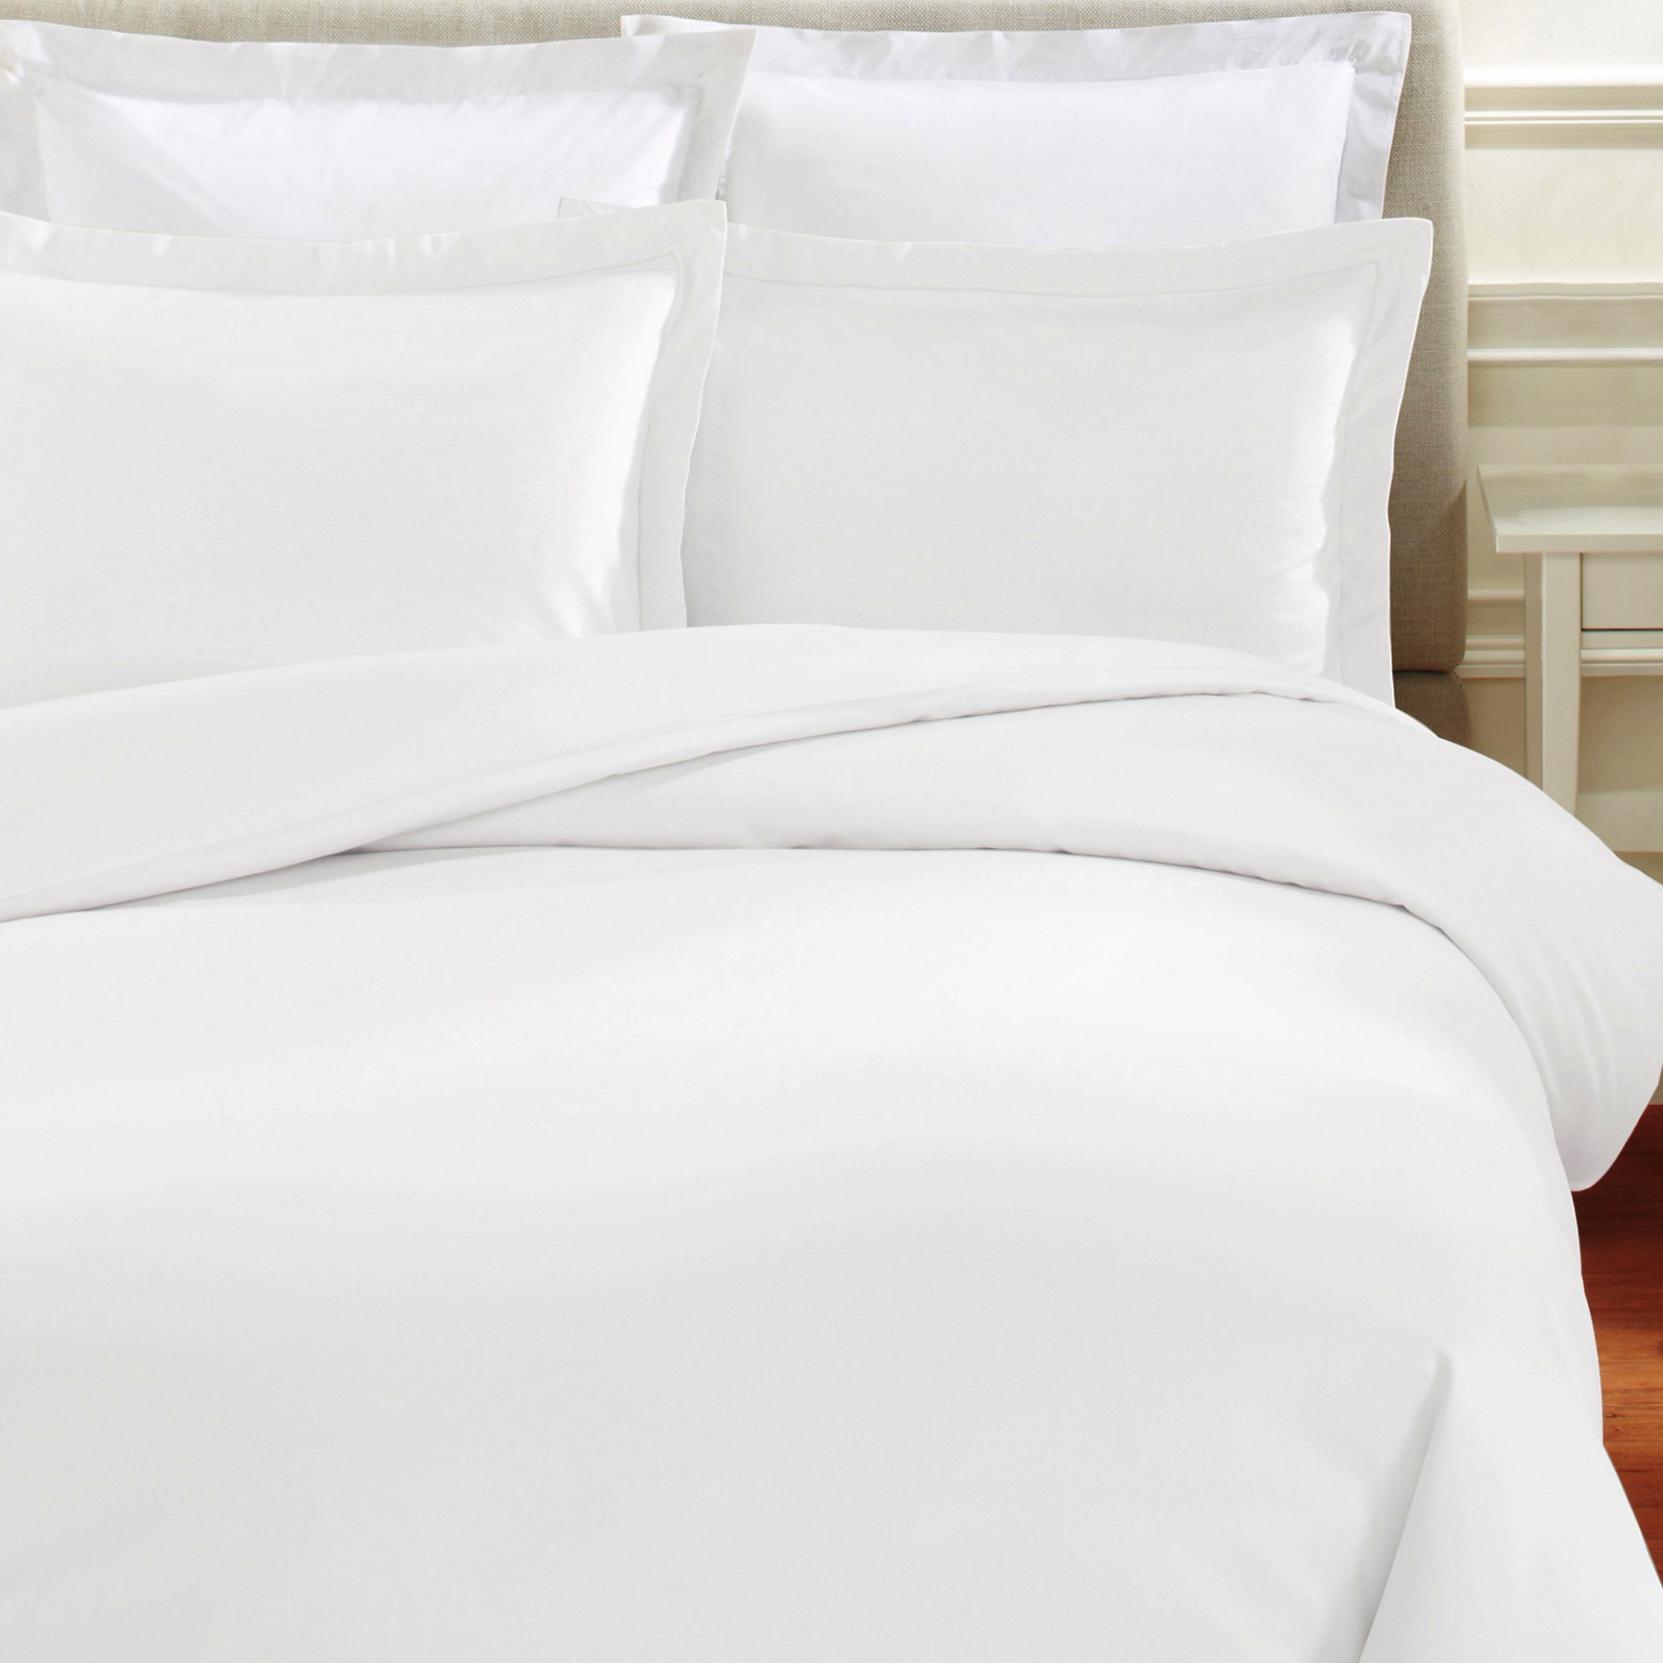 Supima Cotton Duvet Set.jpg